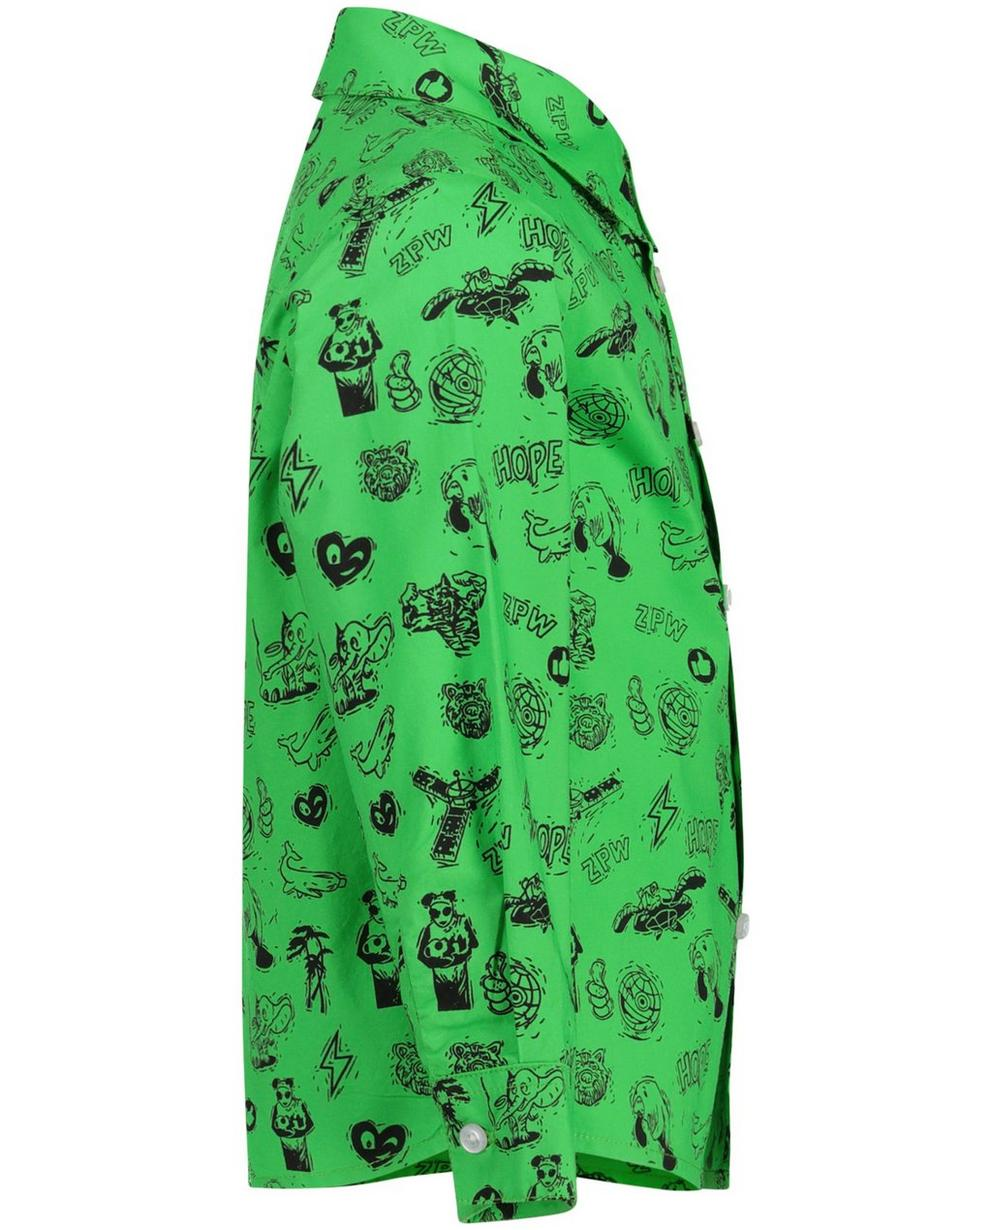 Chemises - bright green - Chemise verte à imprimé